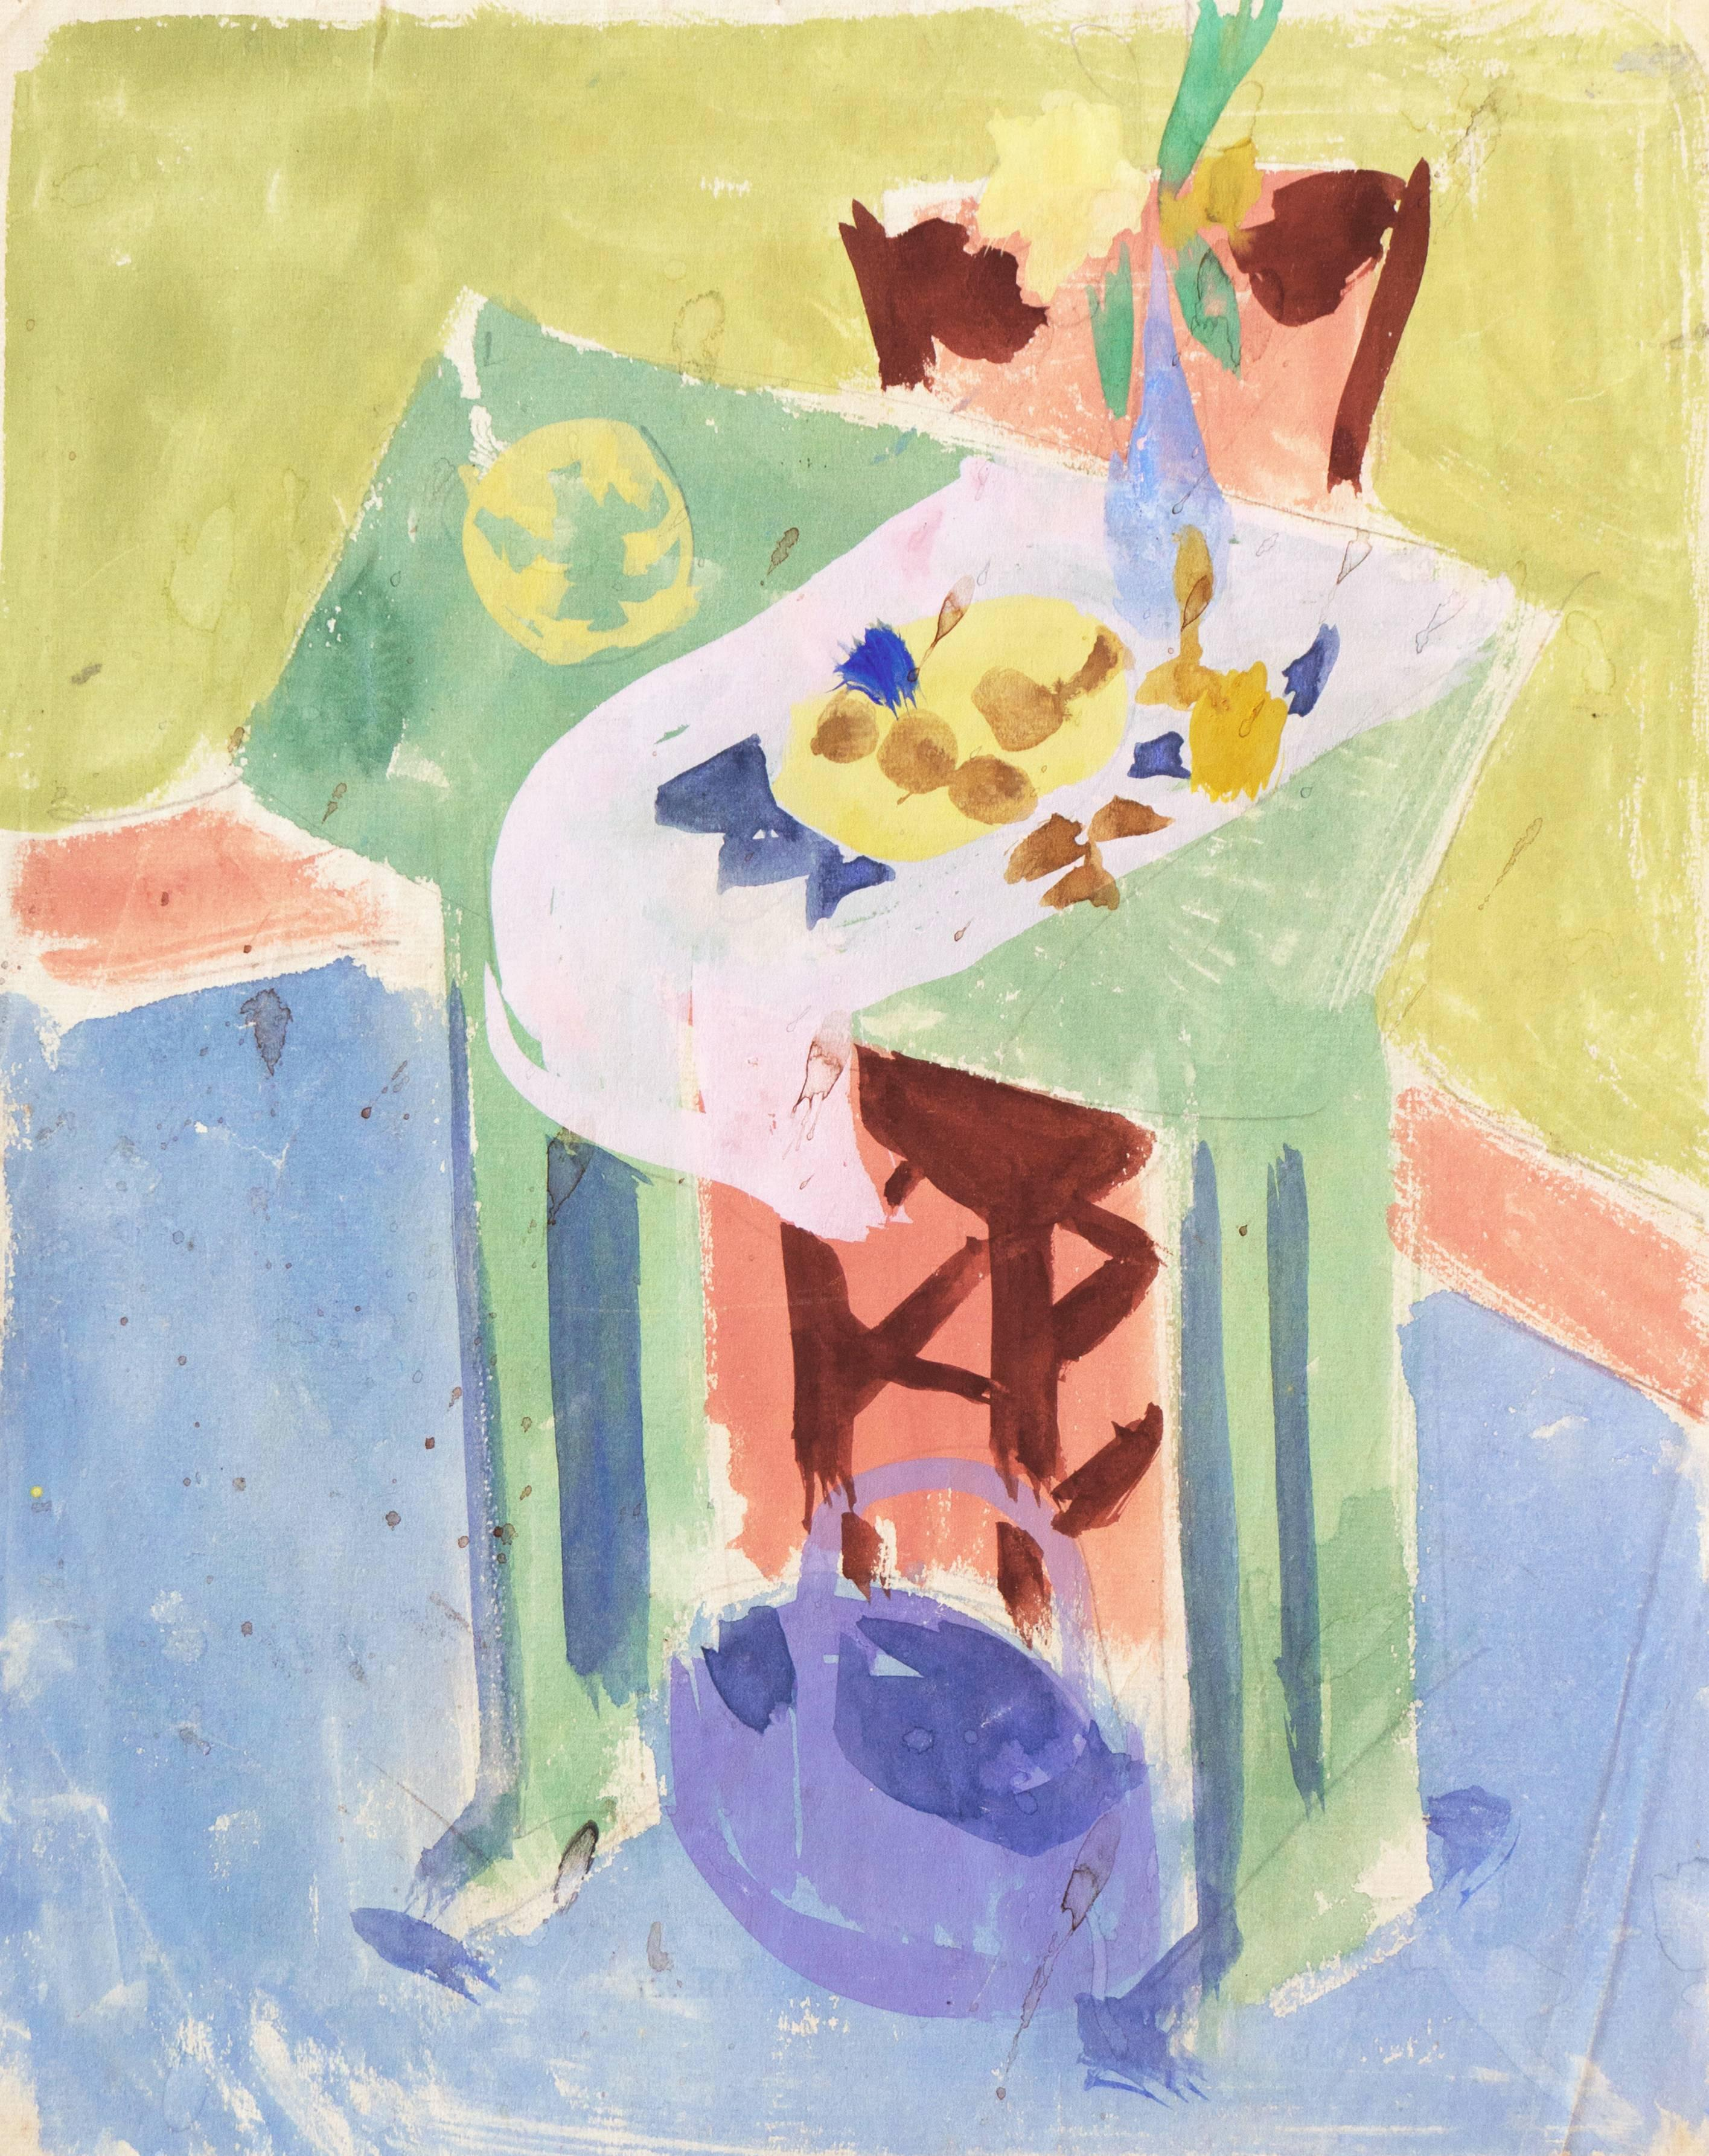 'Still Life', California Post-Impressionist, Louvre, Académie Chaumière, LACMA